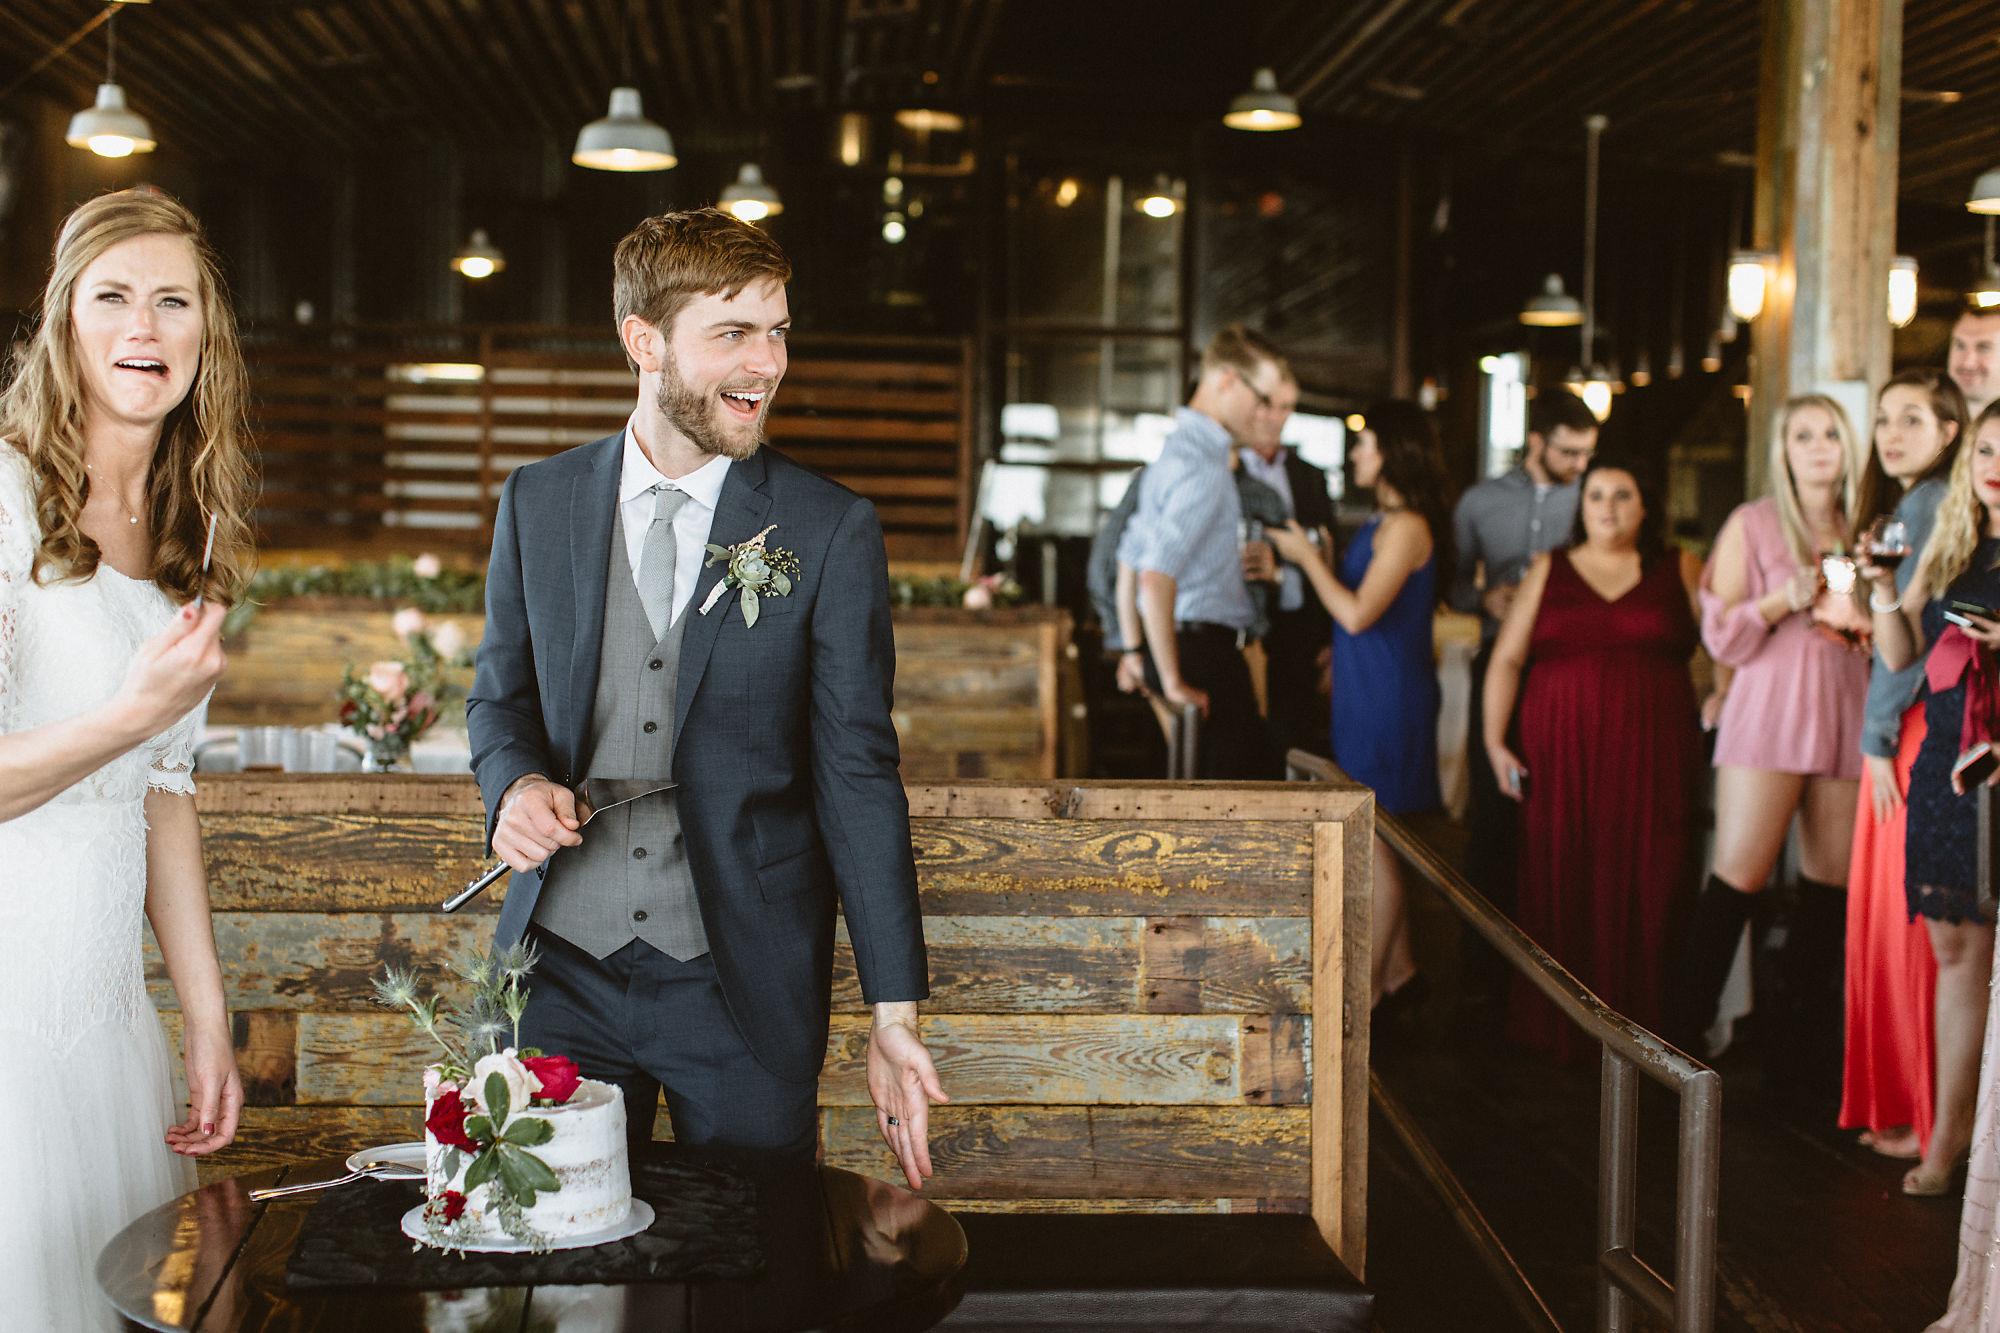 jessica_austin_oasis_brewery_wedding_photos154223.jpg